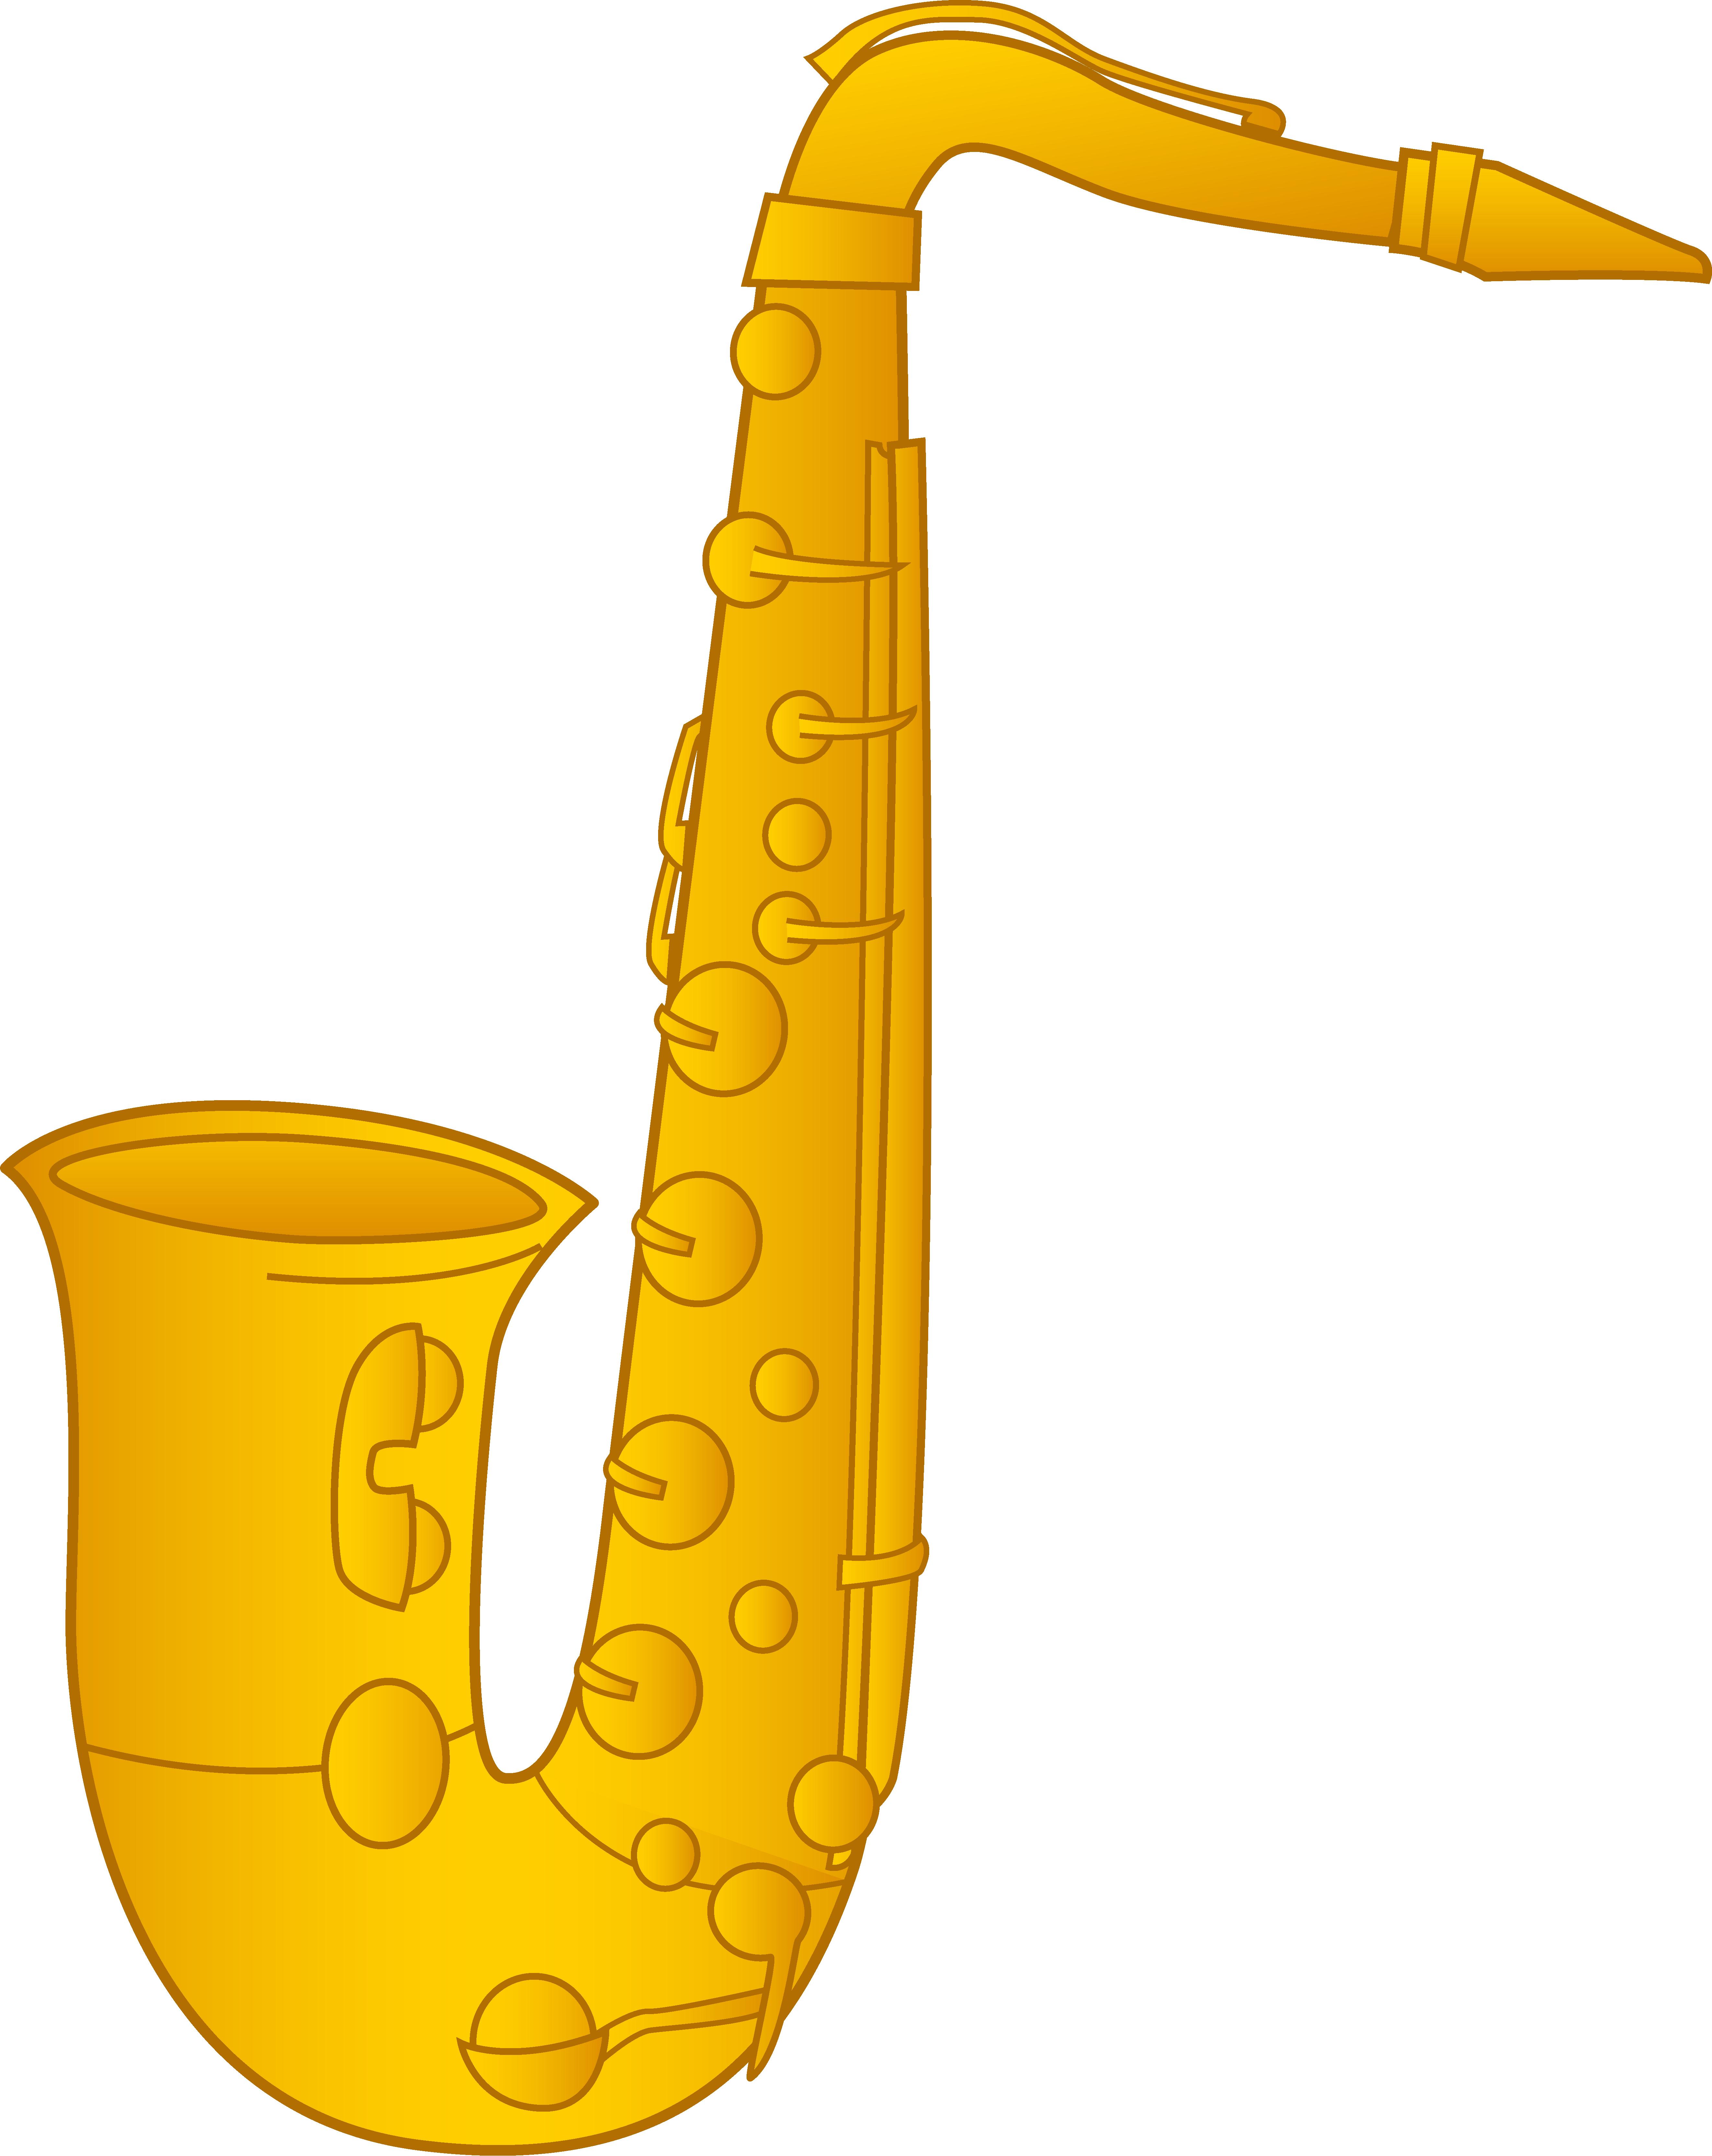 Картинки саксофон с глазами